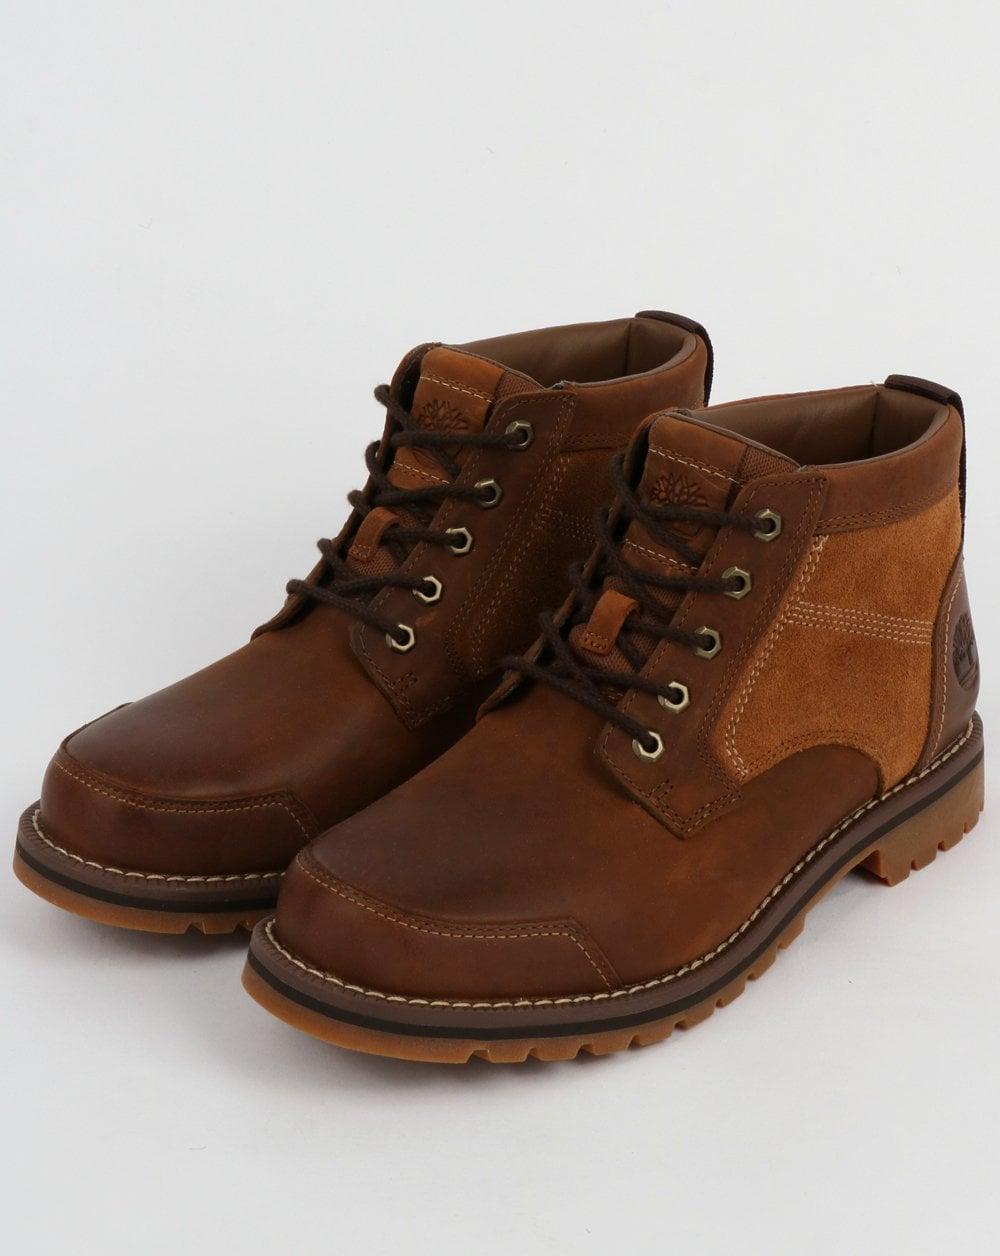 constante conveniencia presentar  Timberland Larchmont Chukka Hiker Boots Brown | 80s casual classics